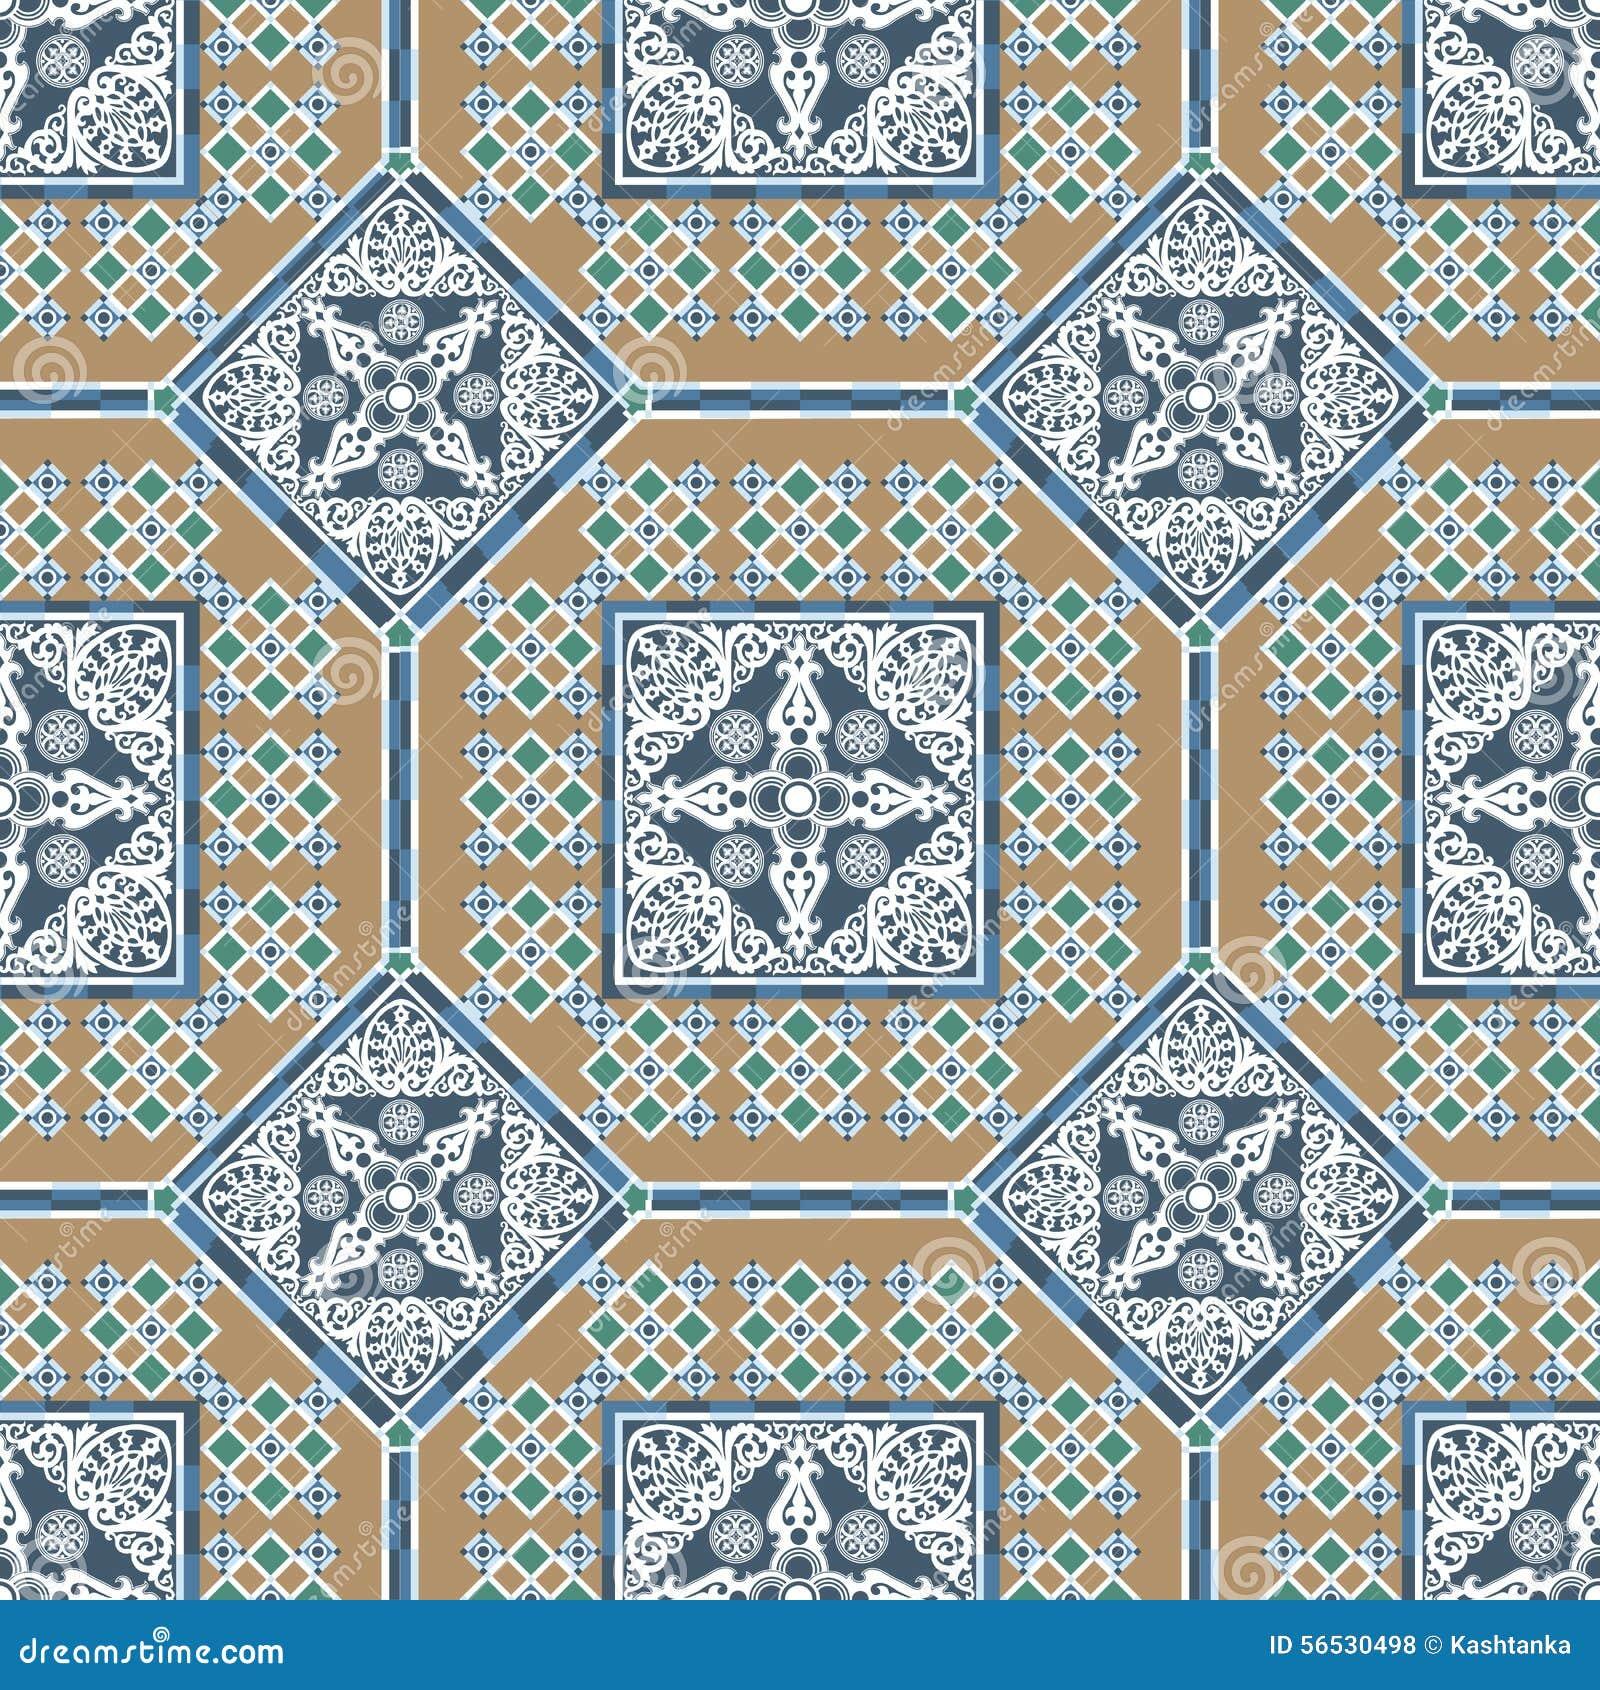 Moroccan Design Moroccan Pattern 3 Stock Vector Image 56530498